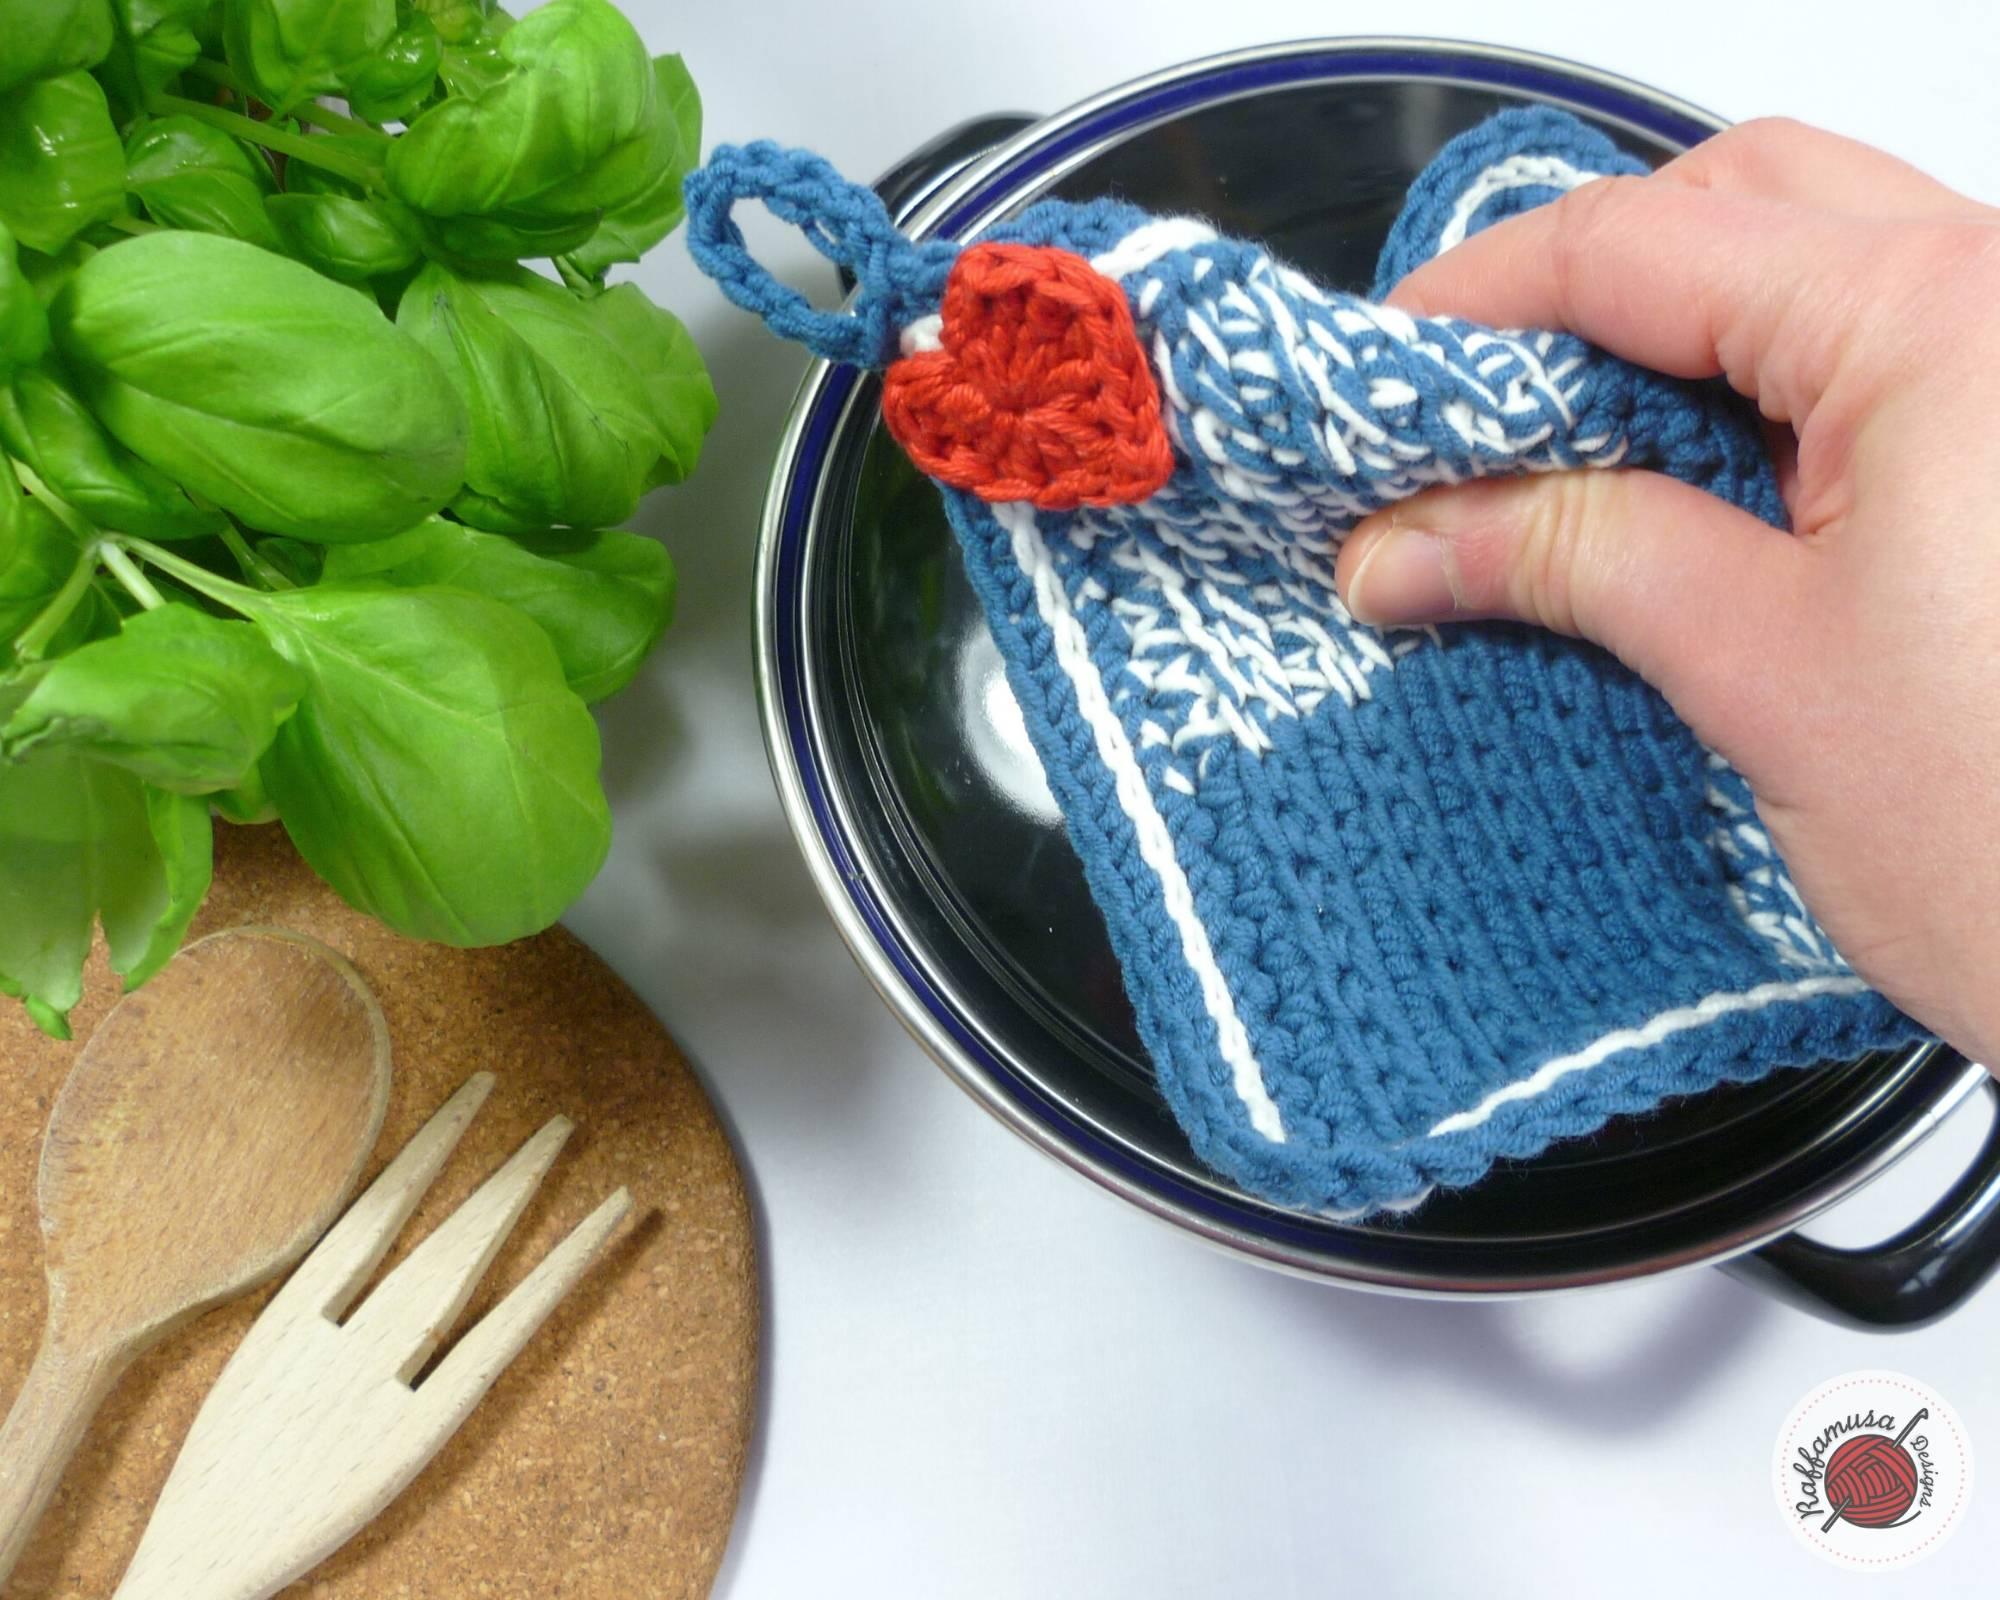 Easy Tunisian Crochet Cottage Potholder - Free Pattern by RaffamusaDesigns